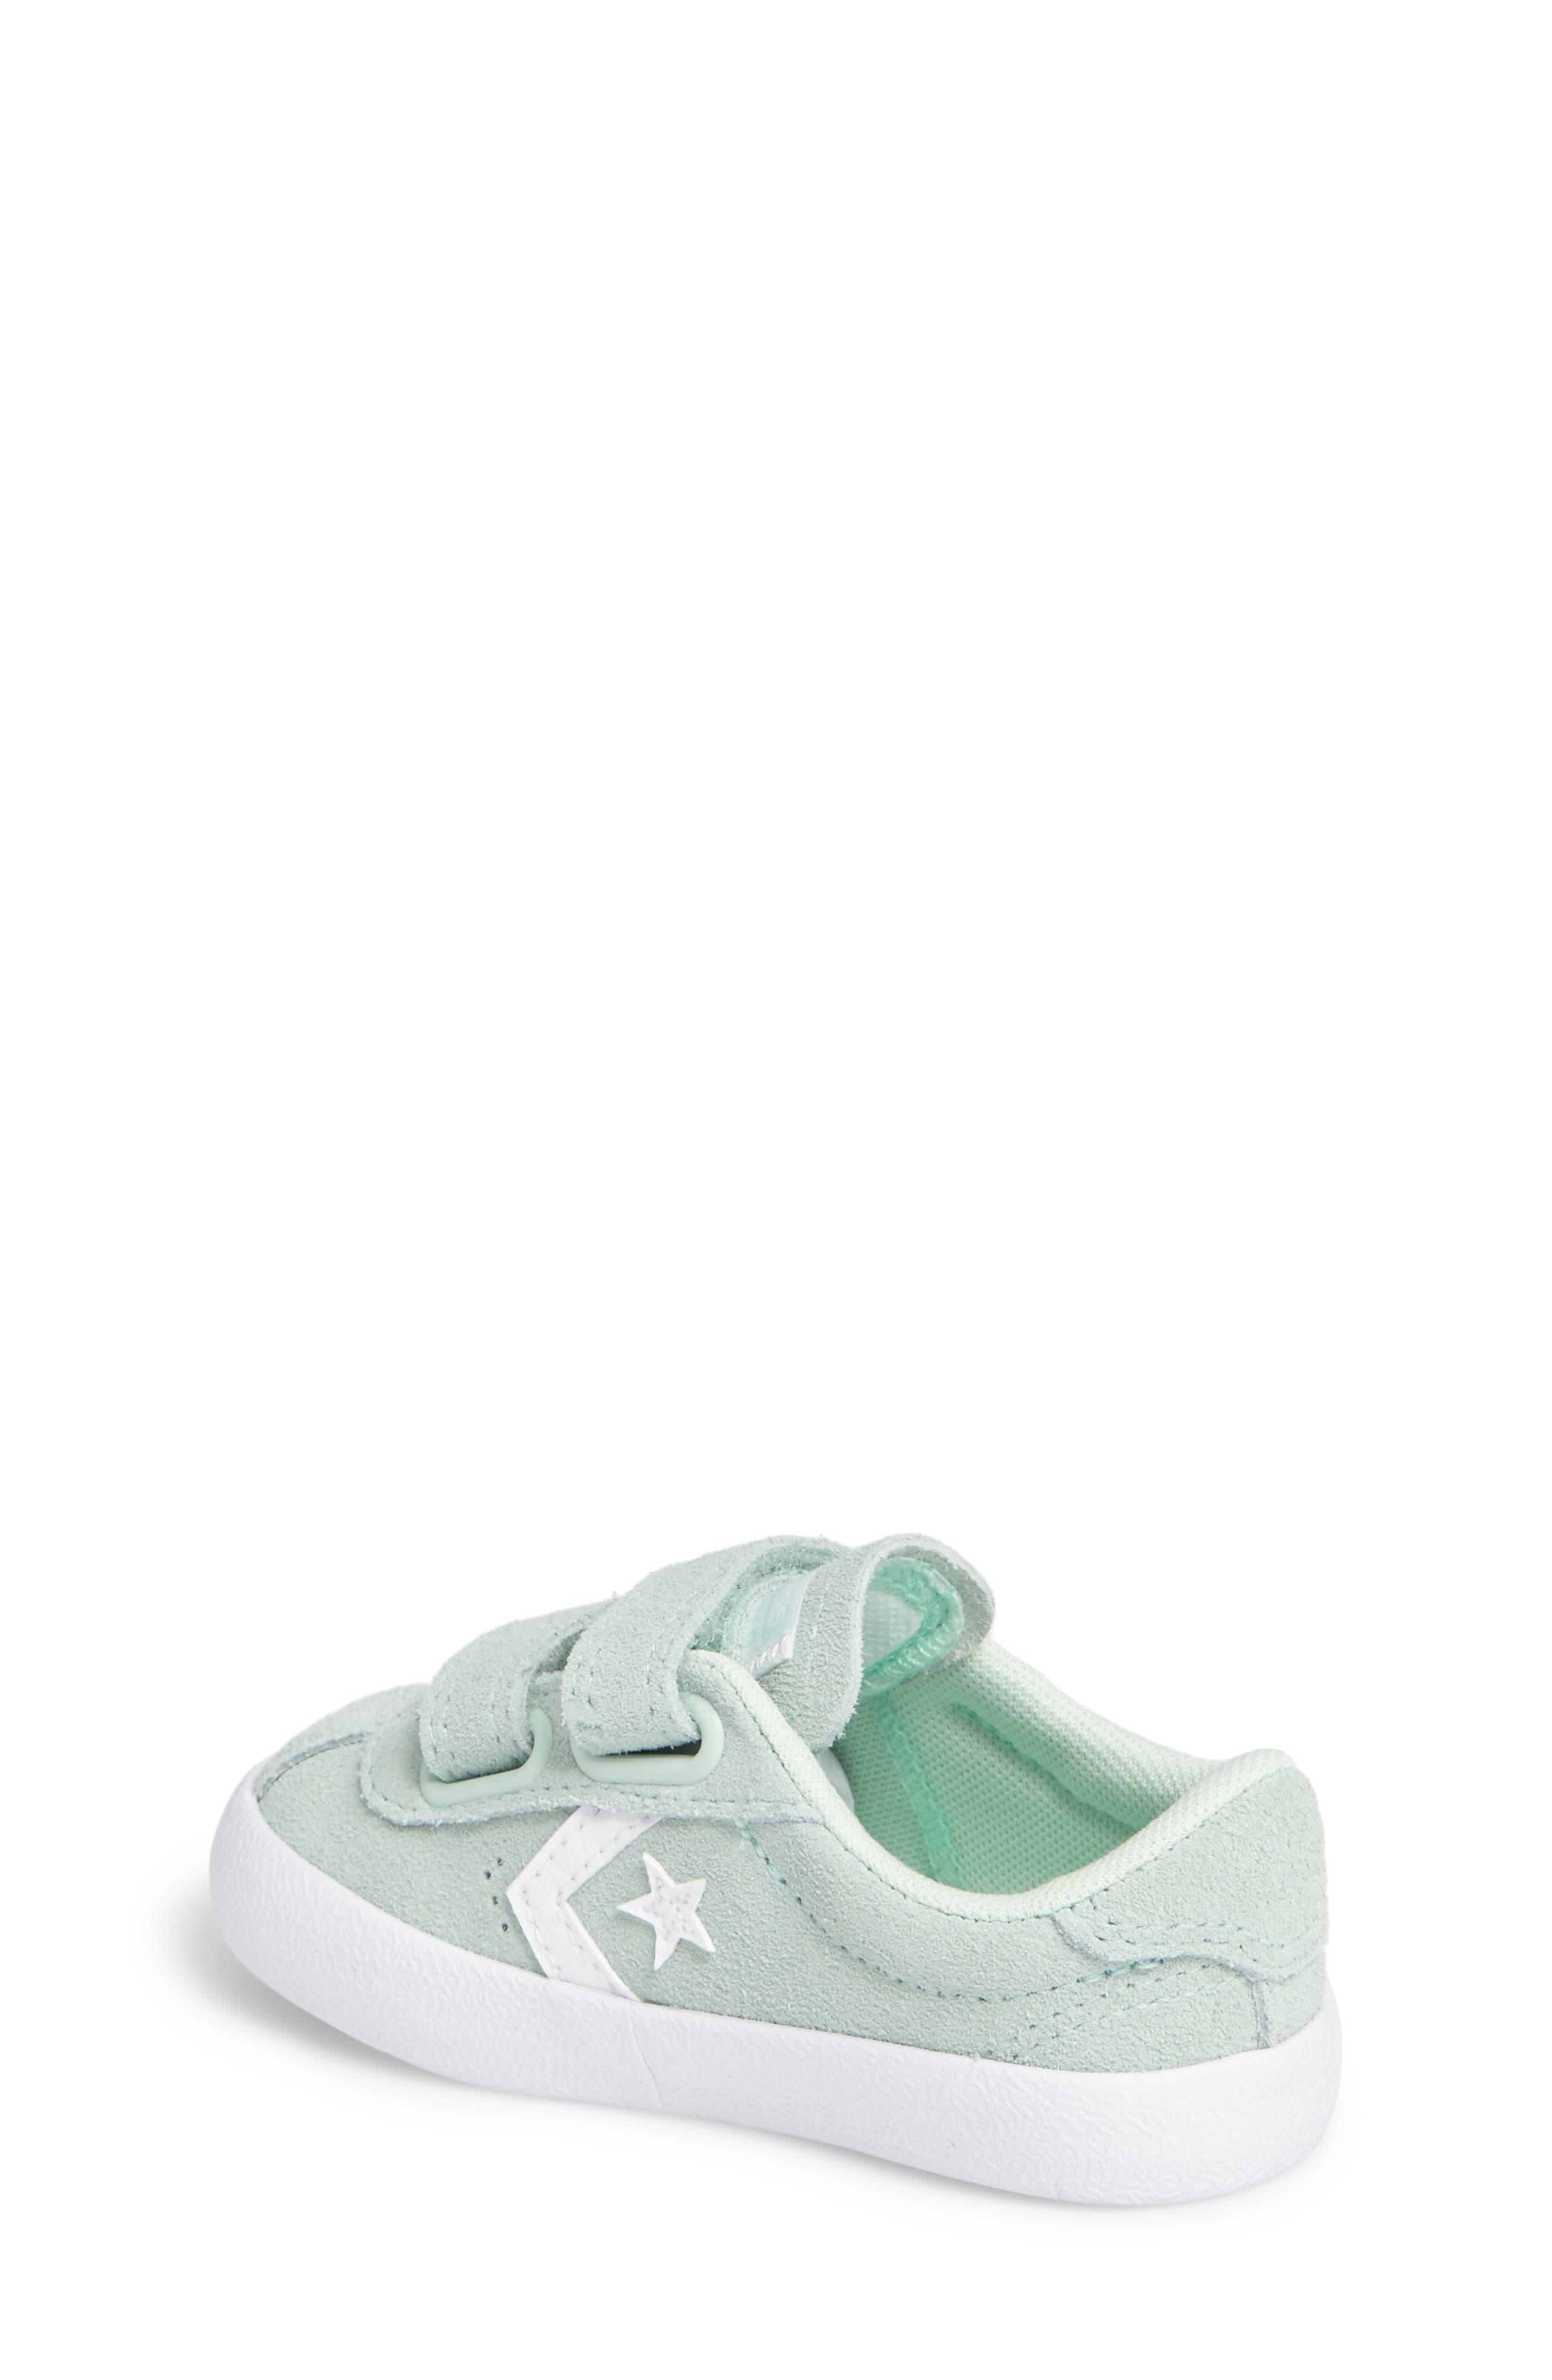 Breakpoint Sneaker,                             Alternate thumbnail 2, color,                             300